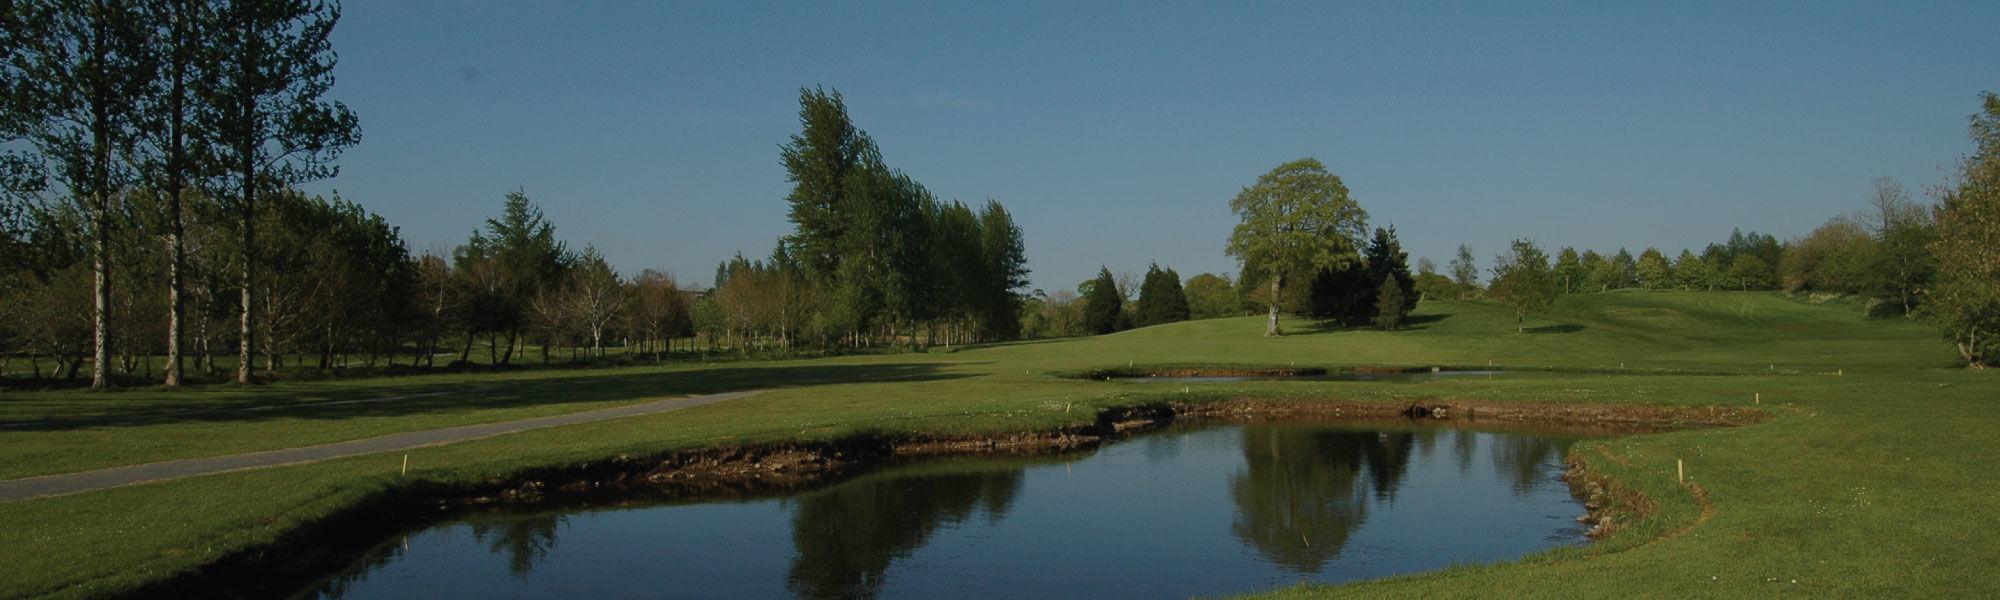 Ballyclare golf club cover picture